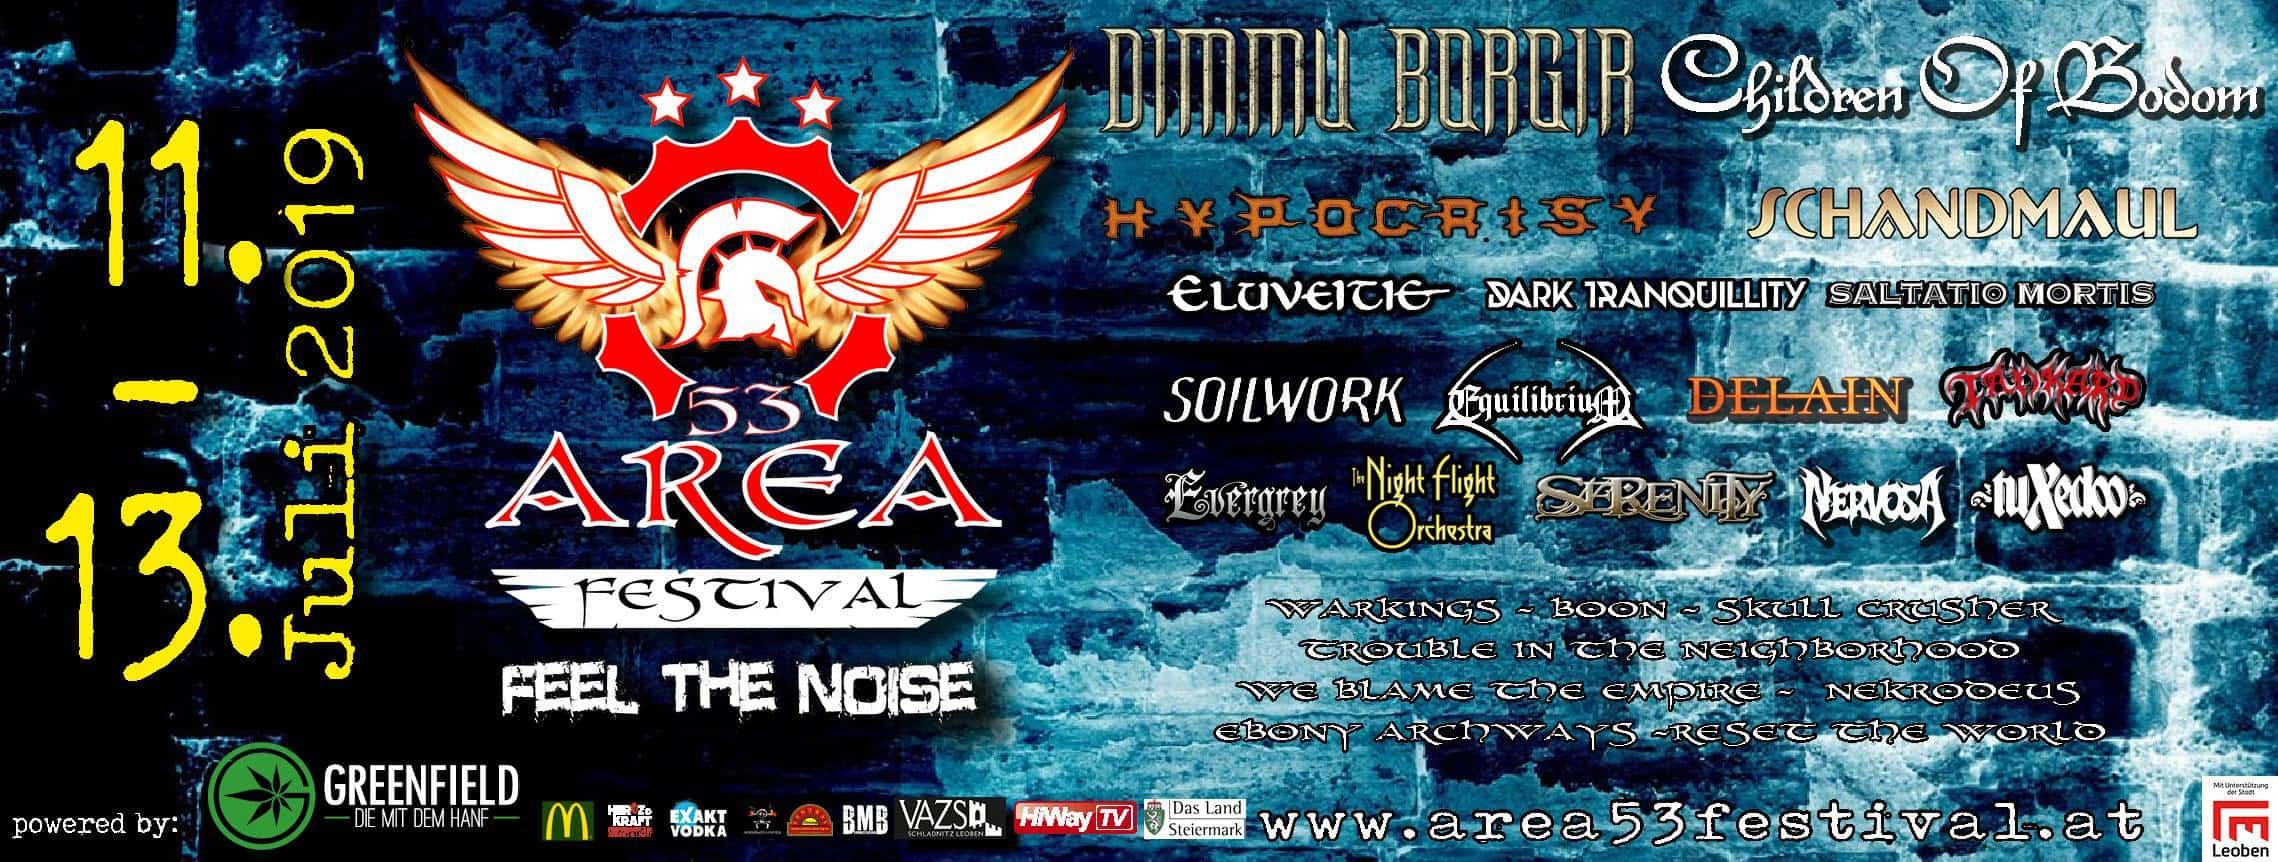 Area 53 Festival